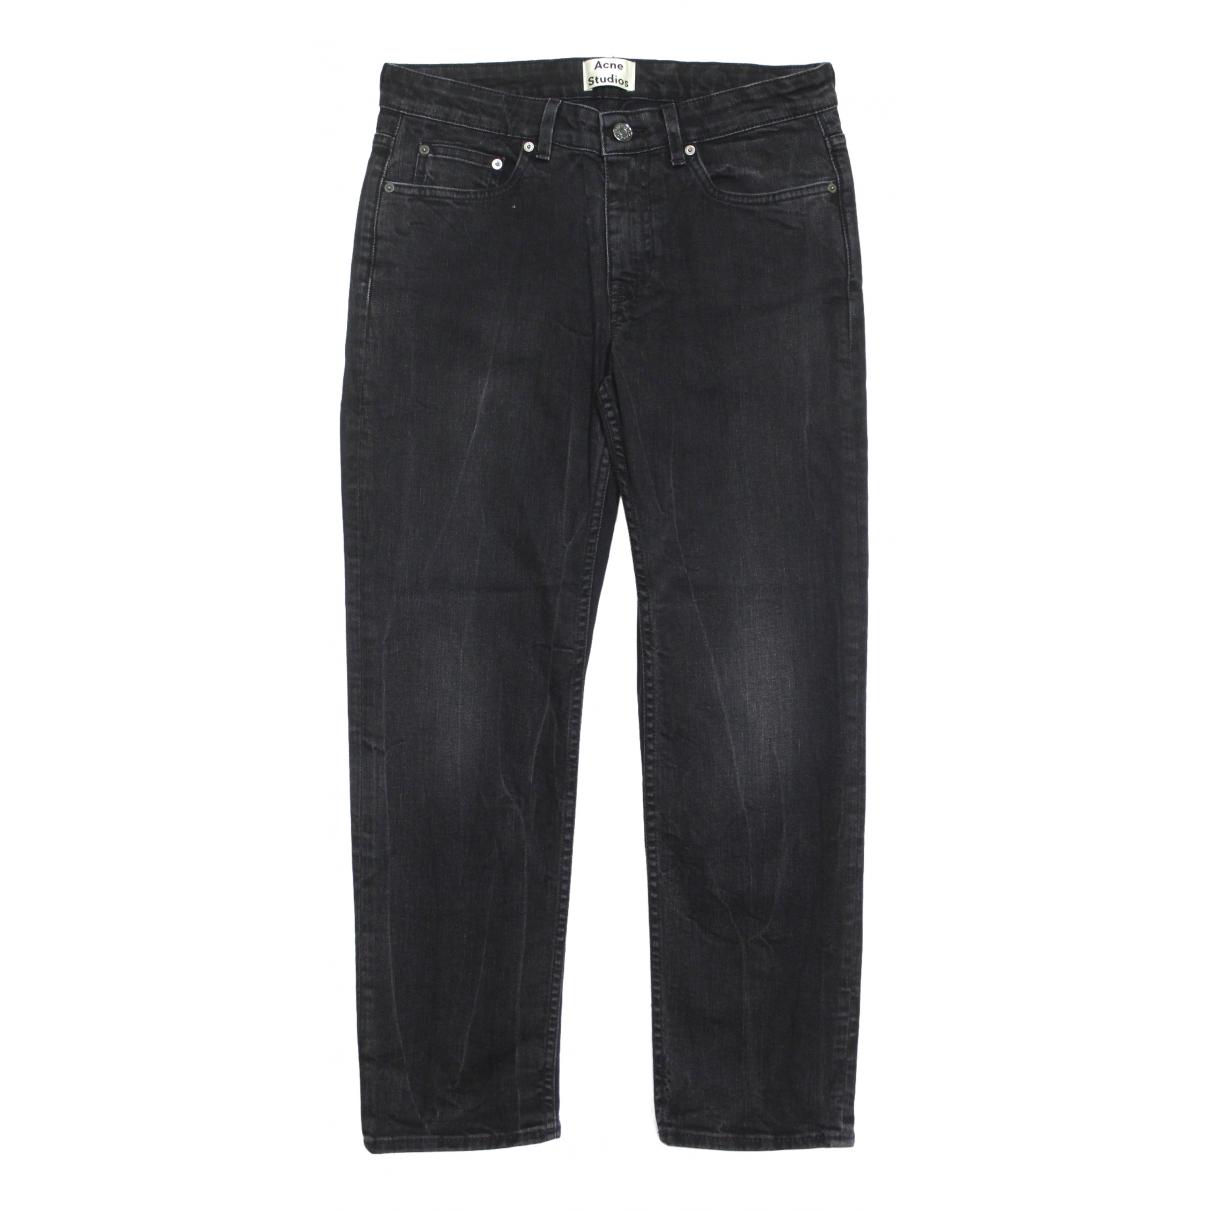 Acne Studios Row Black Cotton - elasthane Jeans for Women 27 US